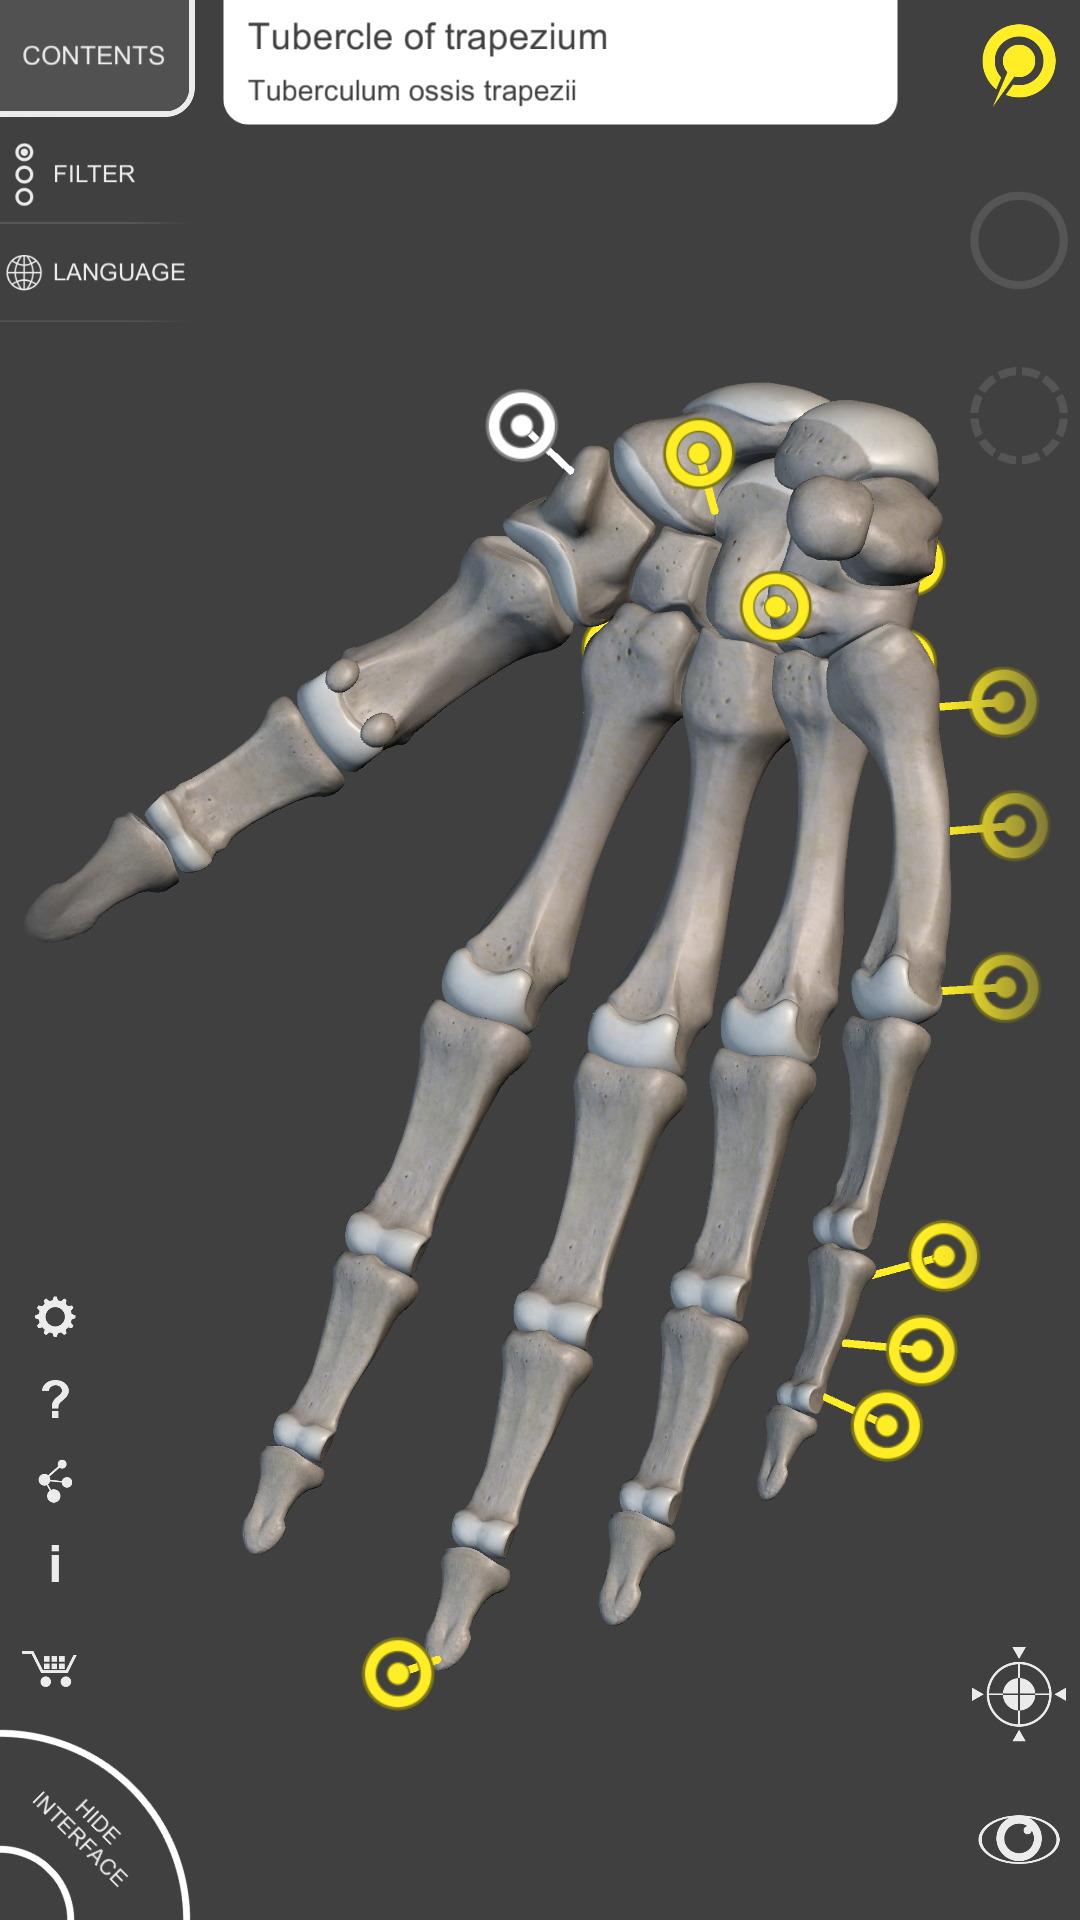 Amazon.com: Skeletal System 3D Atlas of Anatomy Lite: Appstore for ...